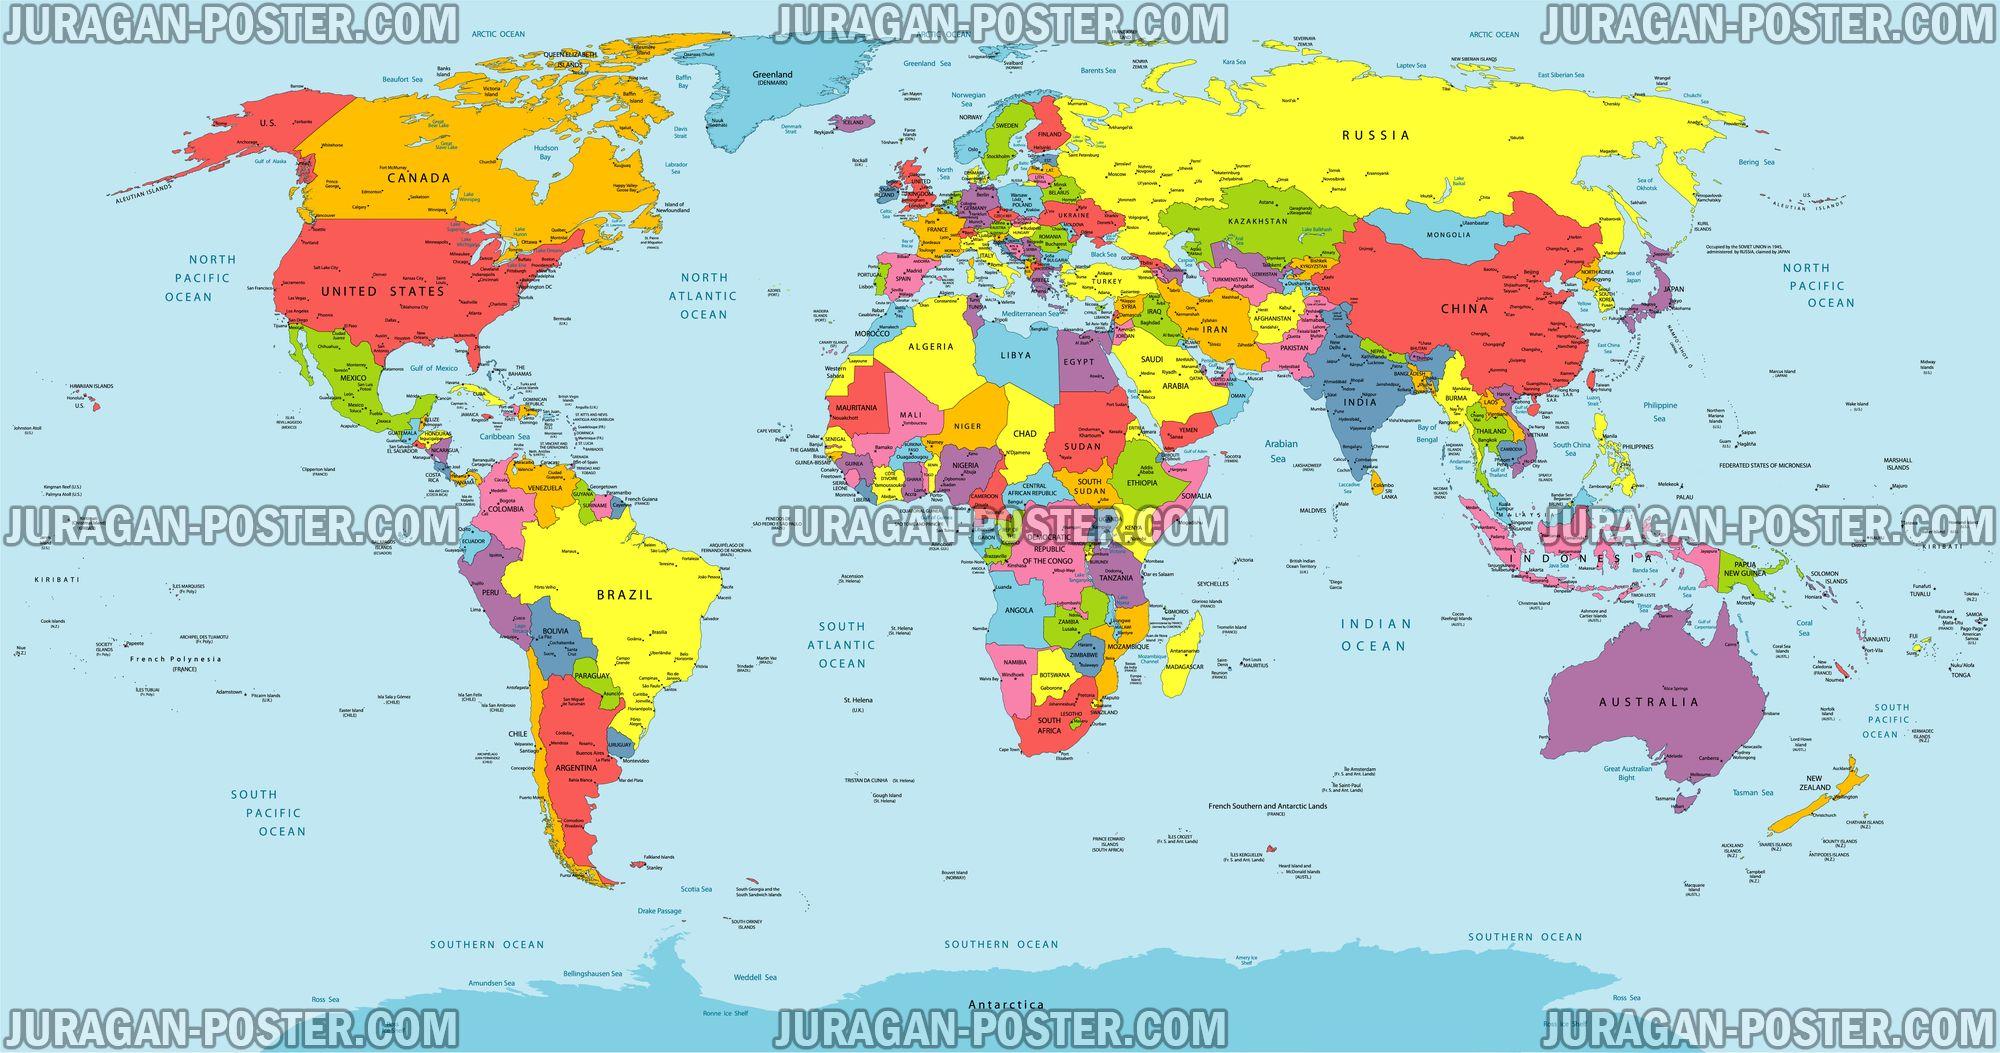 Jual Poster Gambar Peta Dunia 029 120x228cm Bingkai Juragan Murah